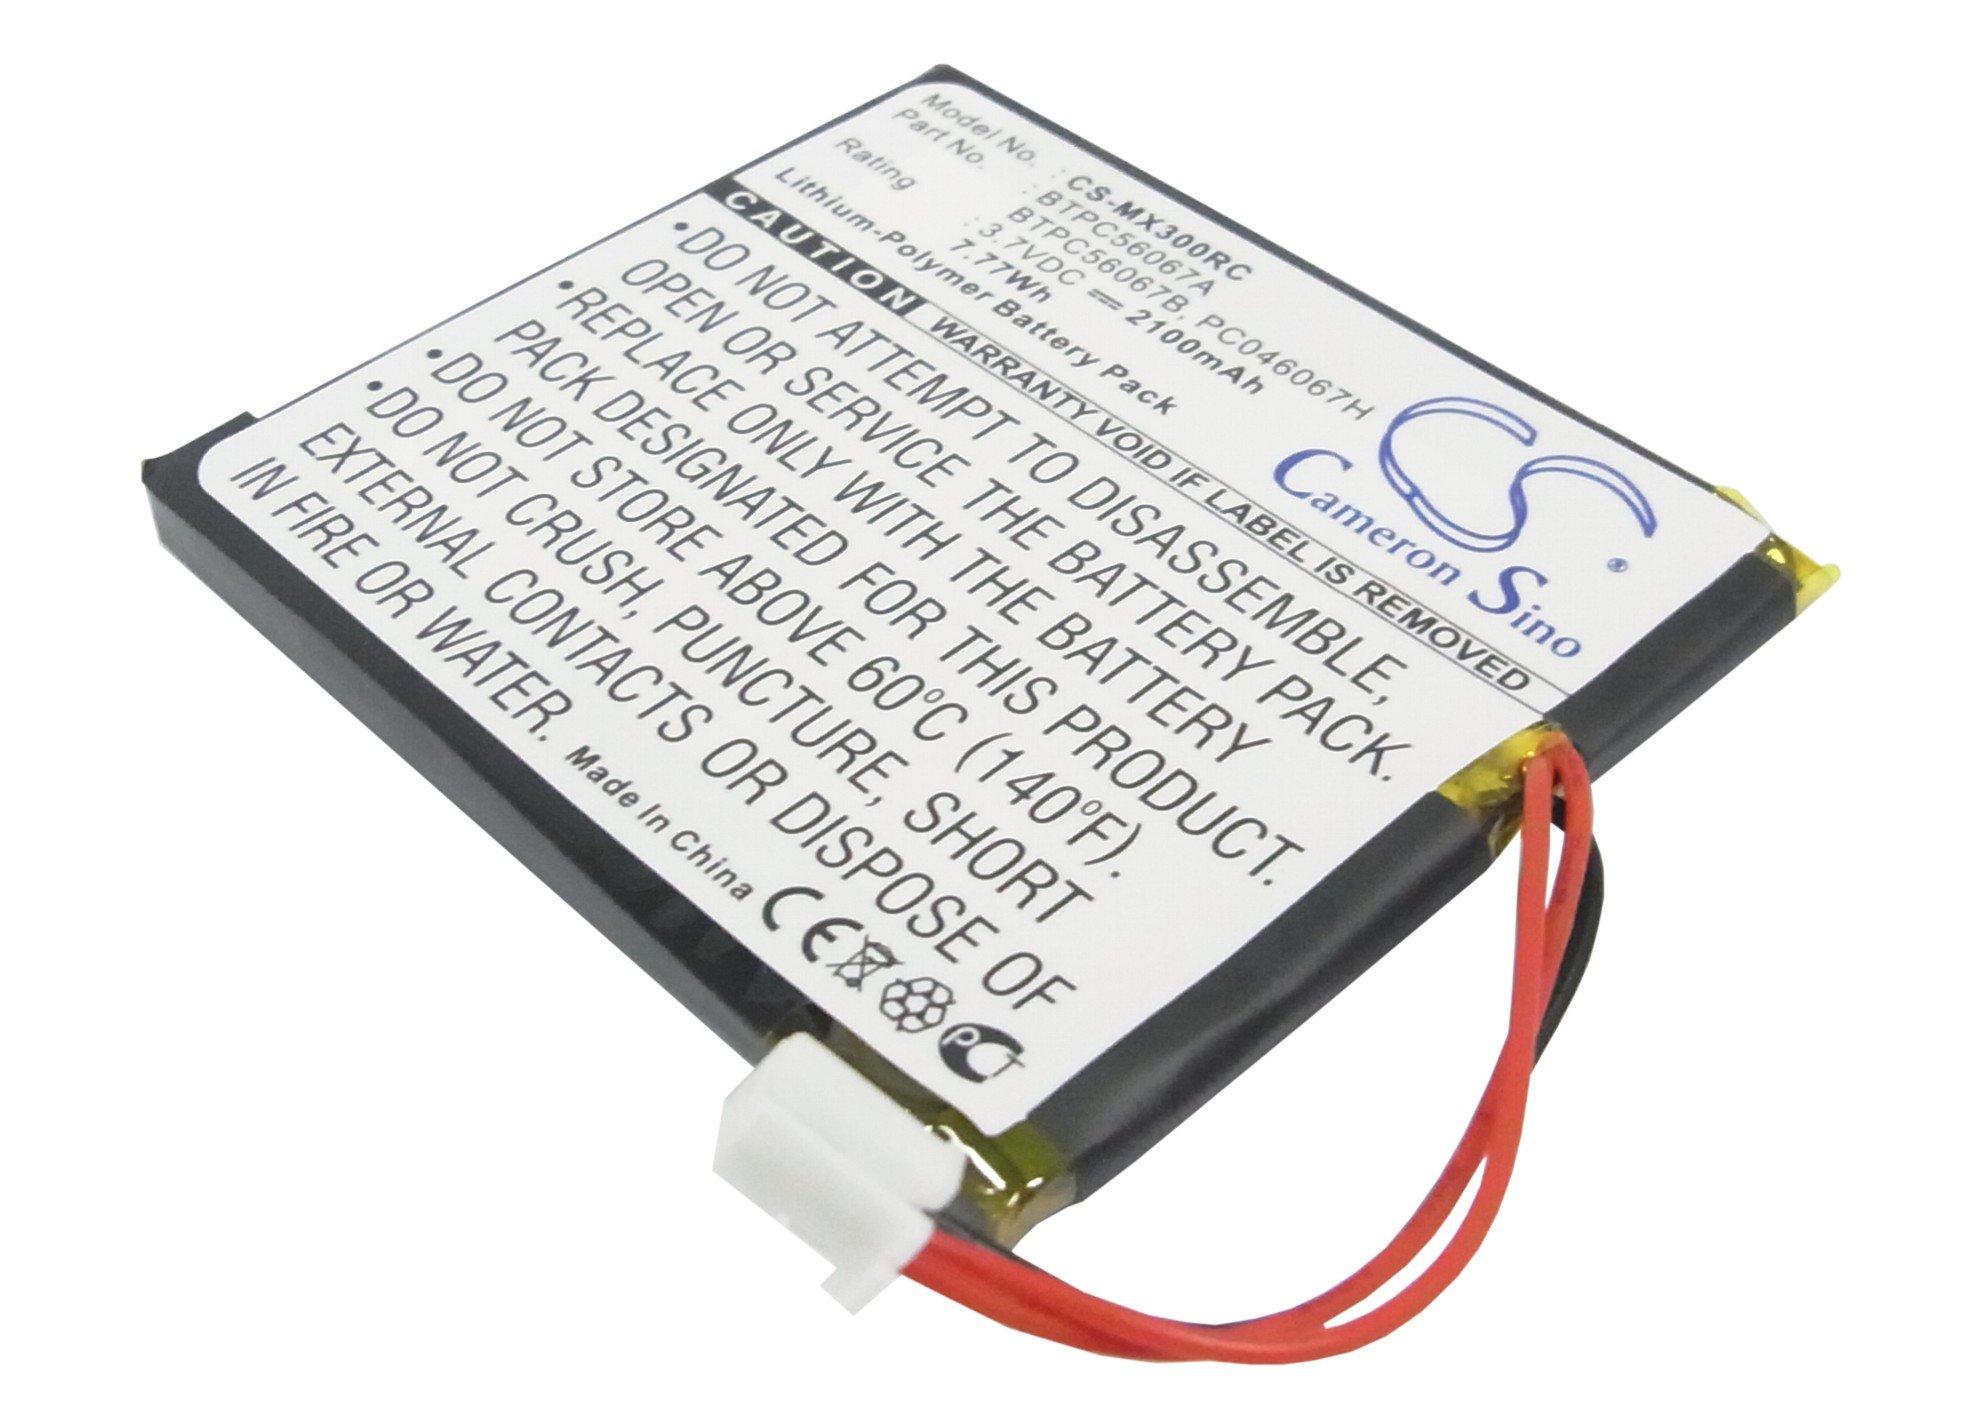 Bateria Para Universal MX-3000 MX-3000i Remote Control